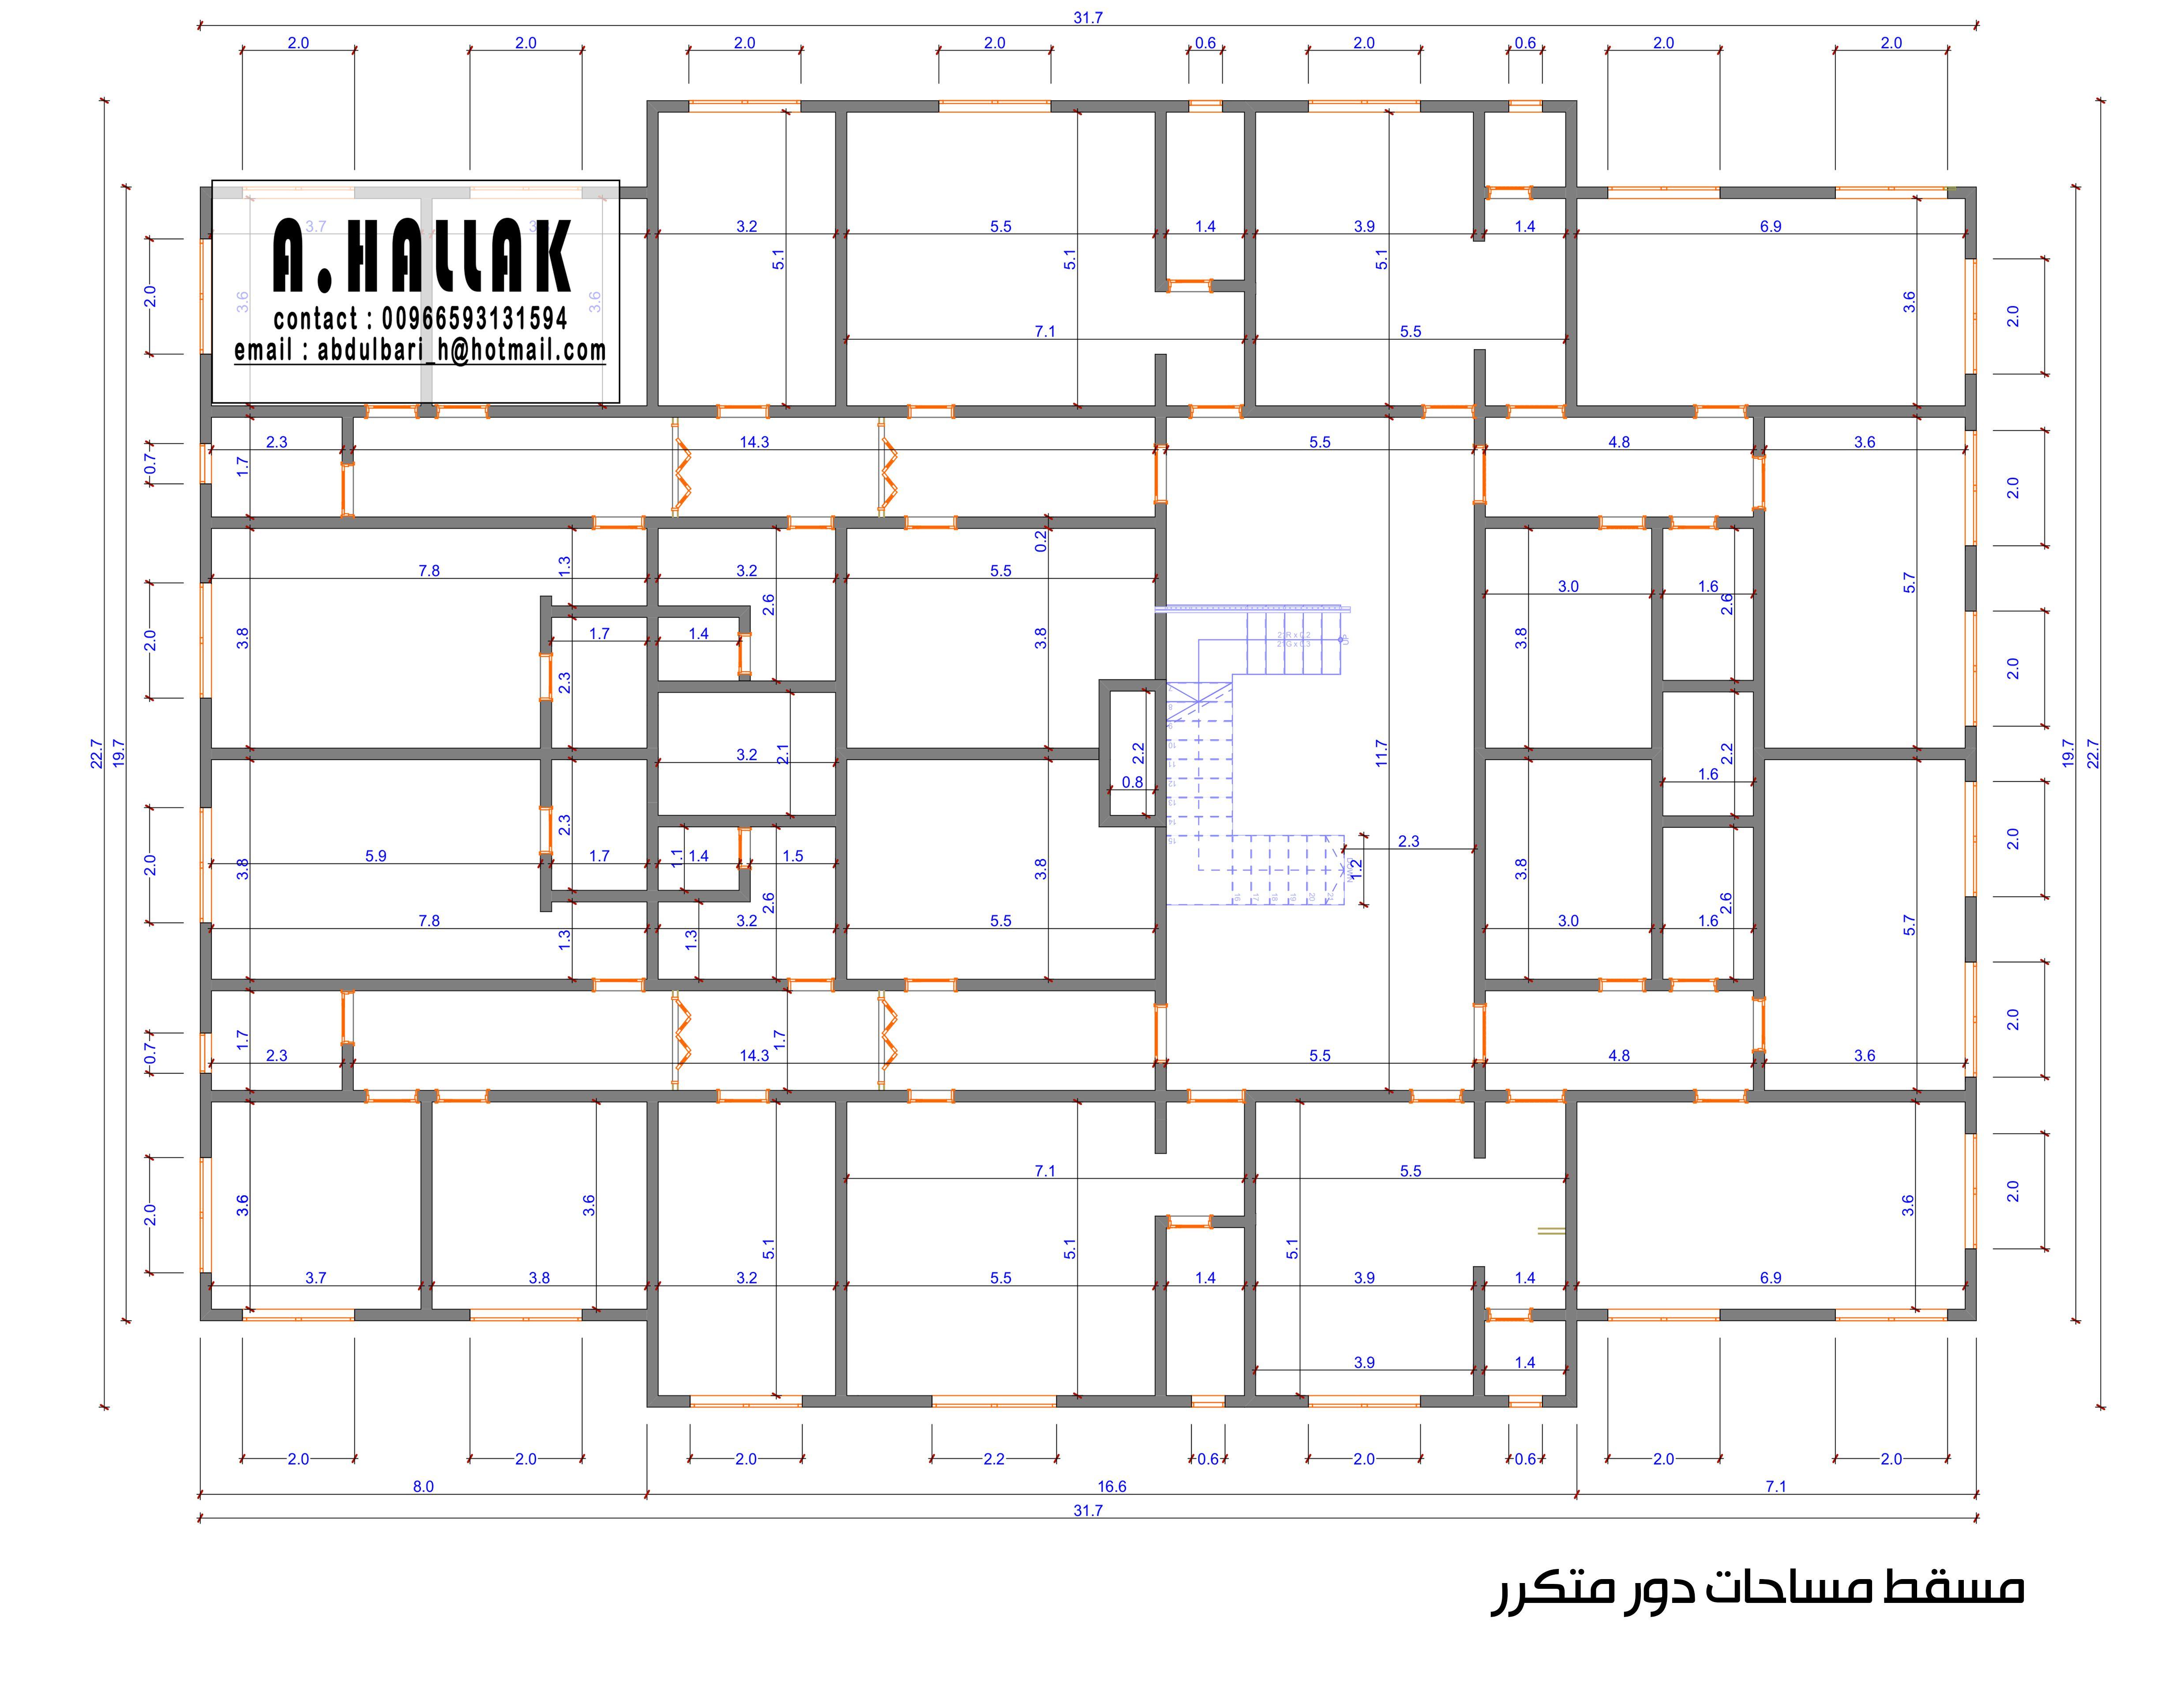 مخطط عمارة How To Plan Floor Plans Diagram